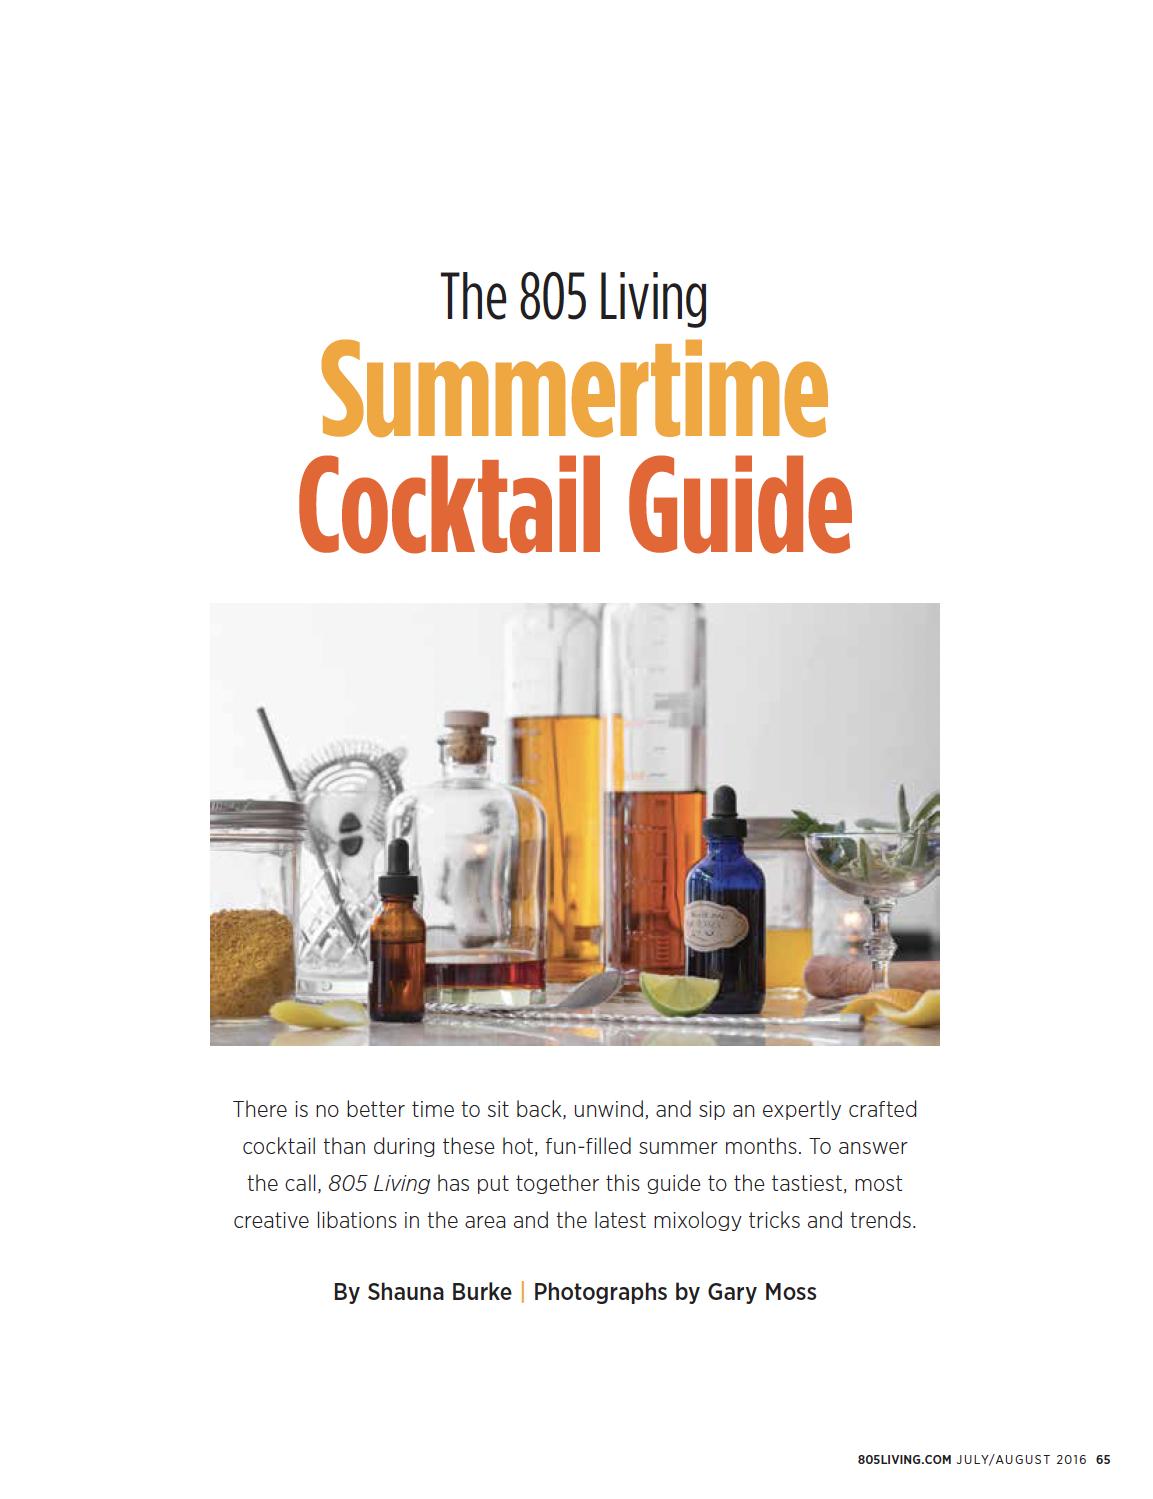 Summertime Cocktail Guide / 805 Living